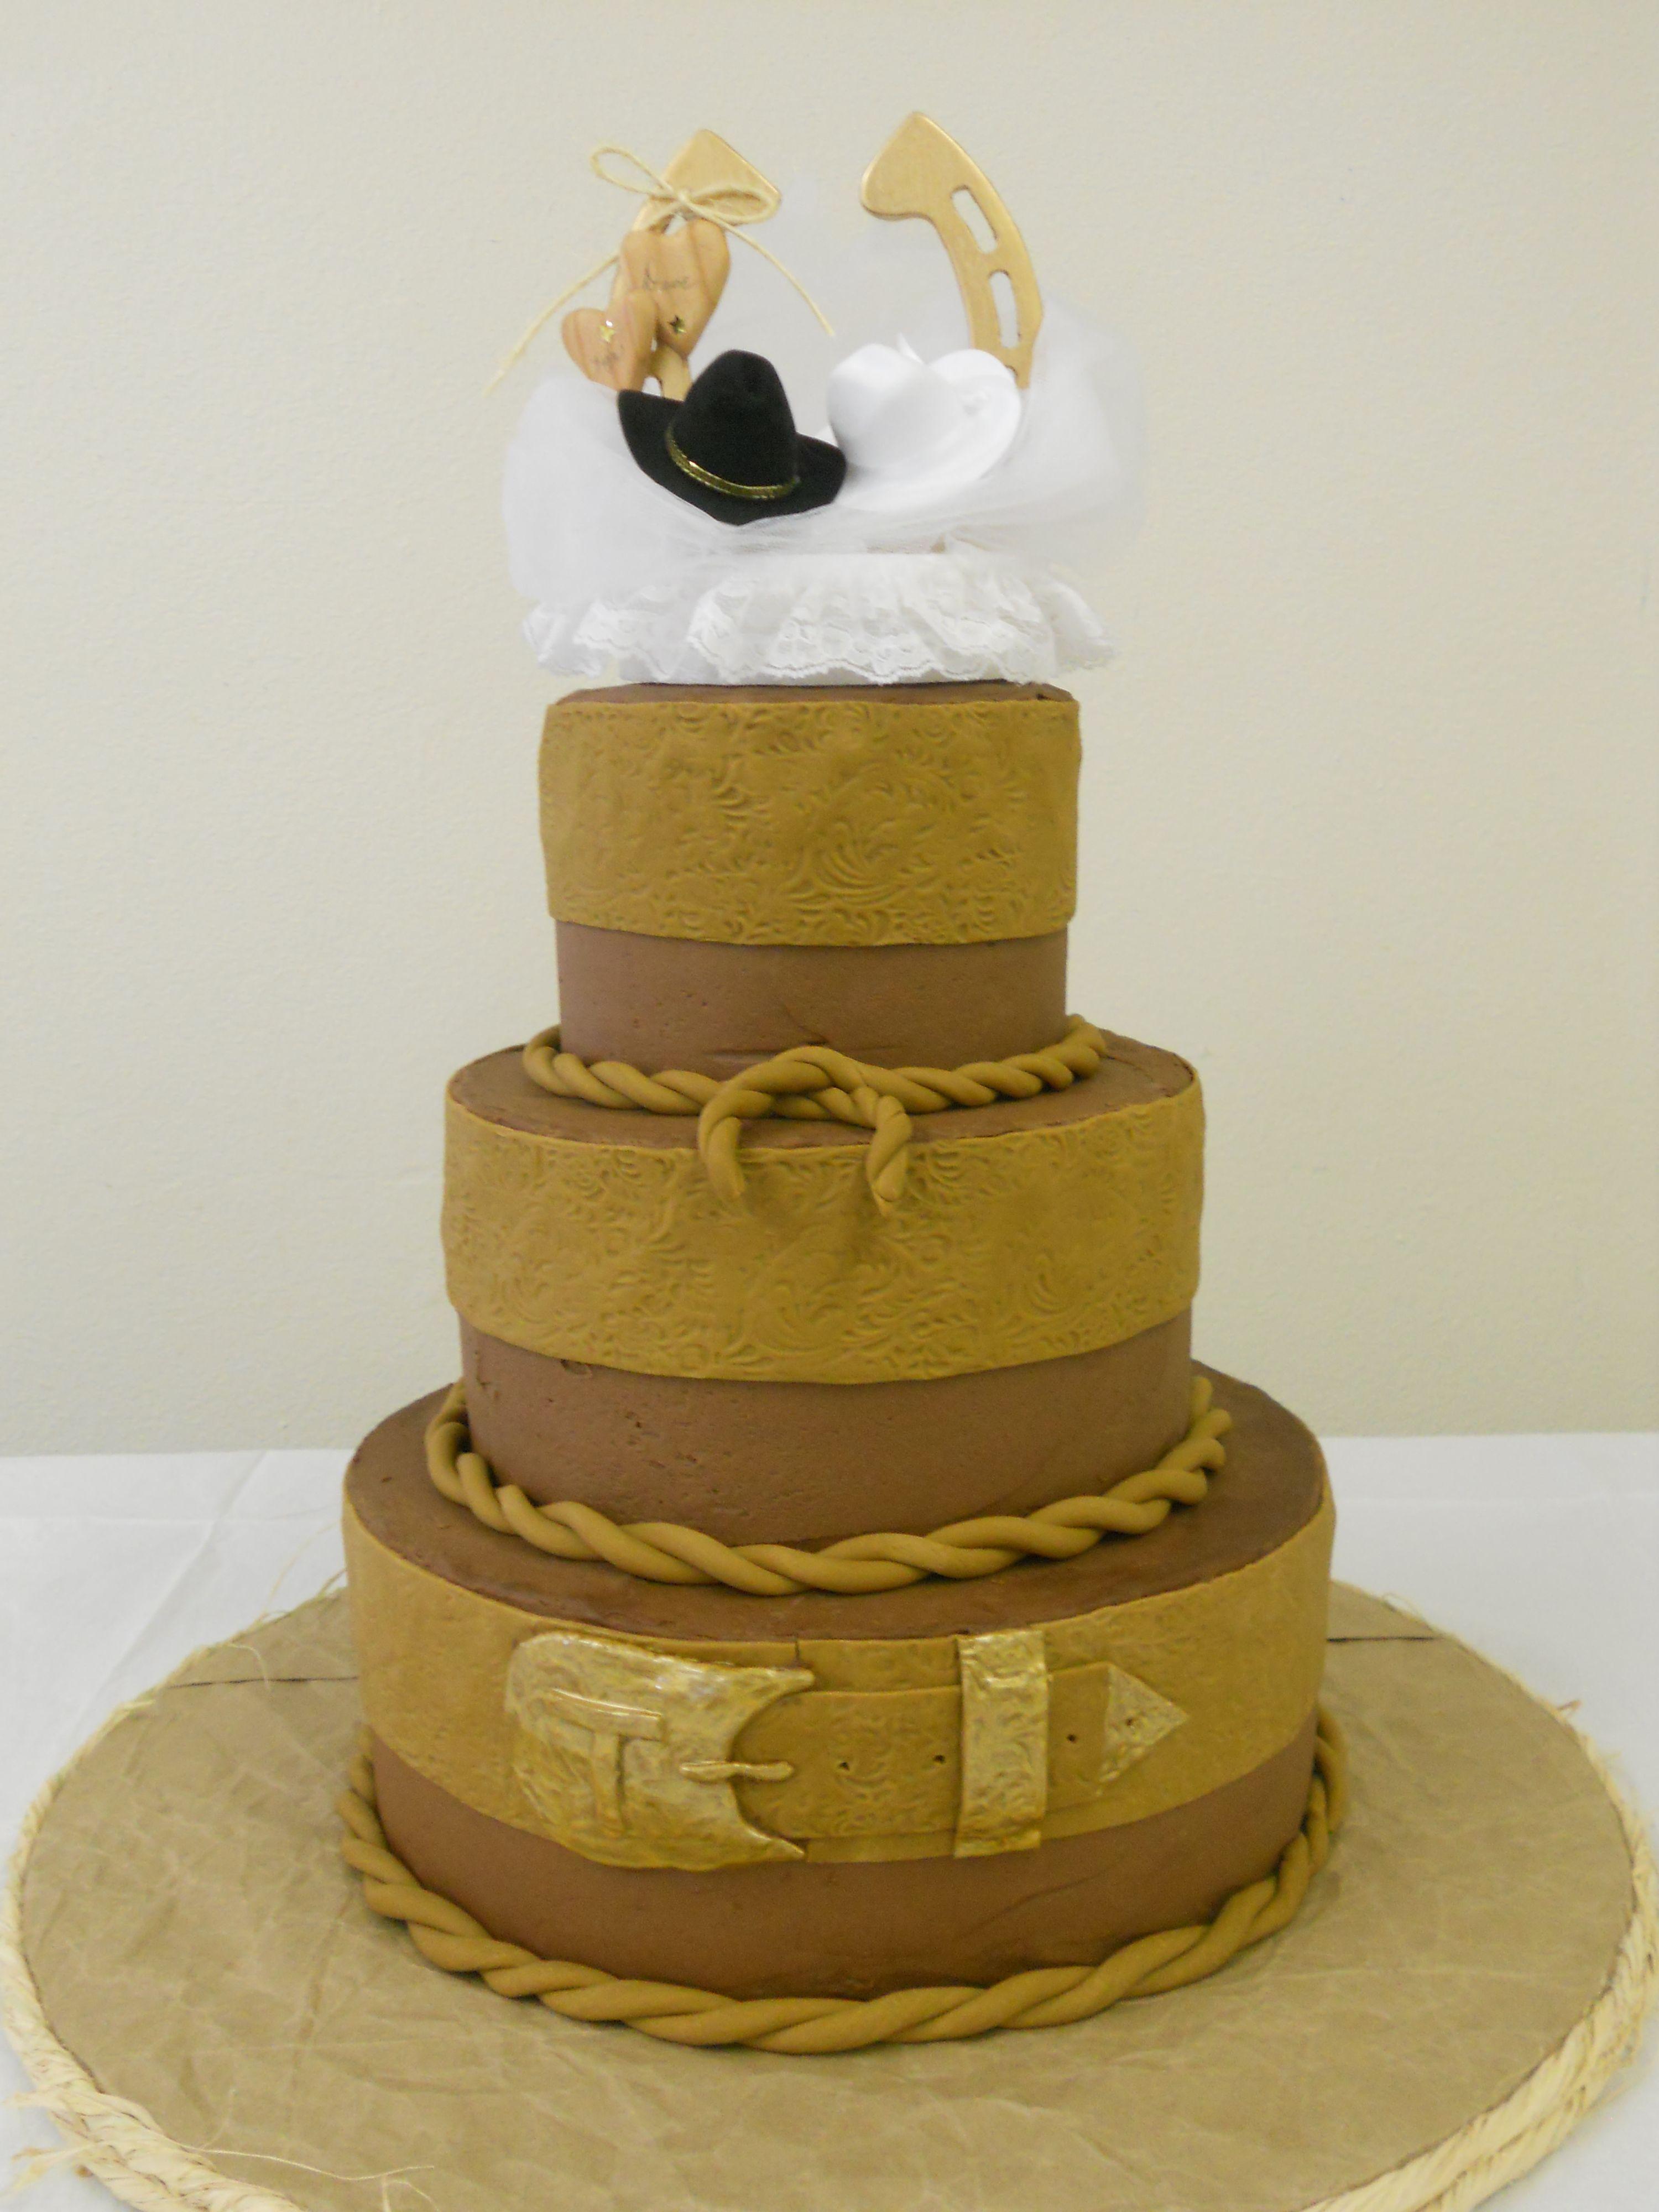 Western wedding cake | Things I love | Pinterest | Western wedding ...